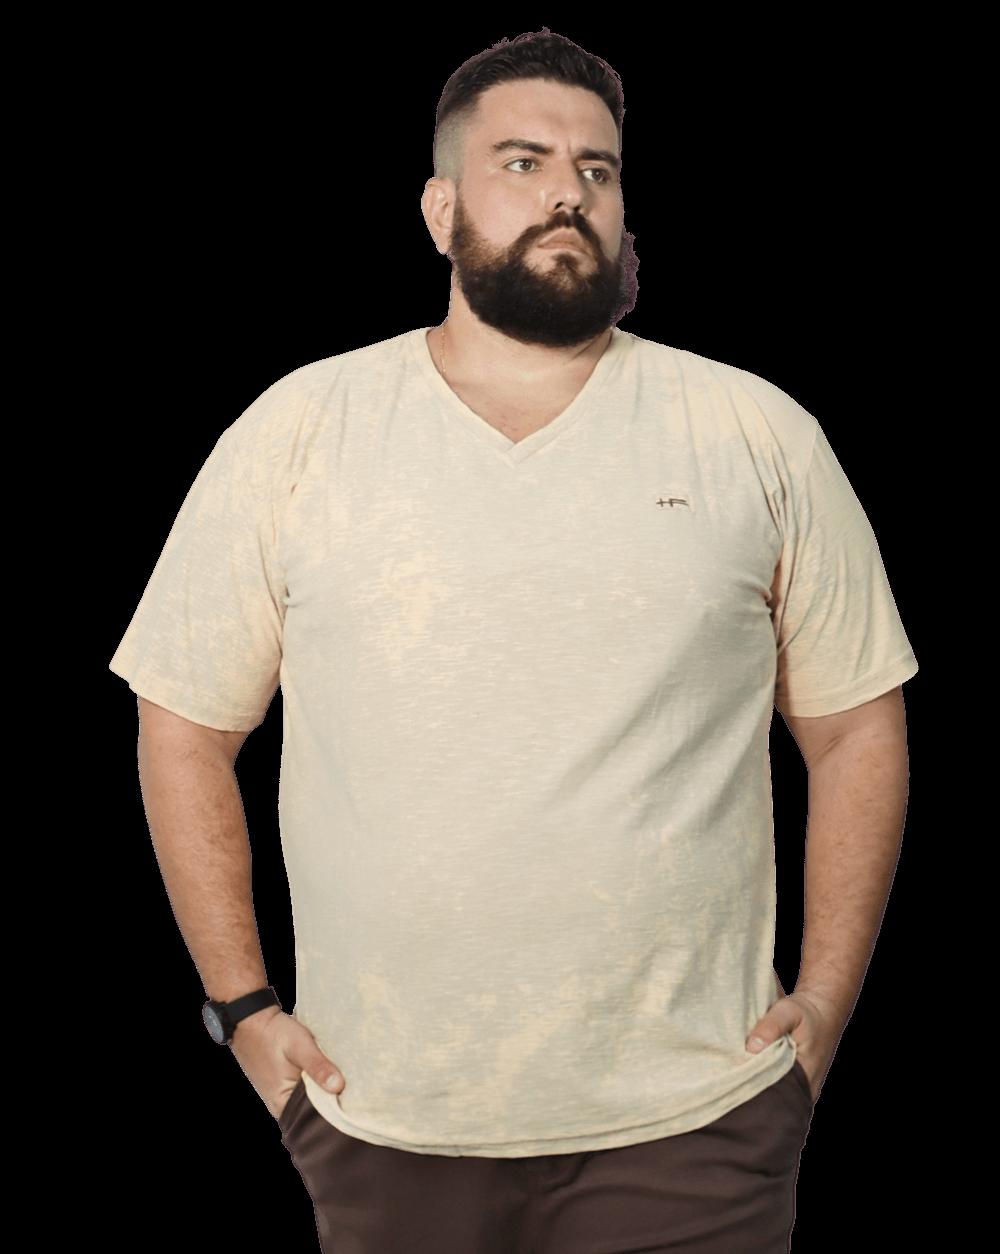 Camiseta Gola V Lavagem Tie Dye Plus Size - Promoção